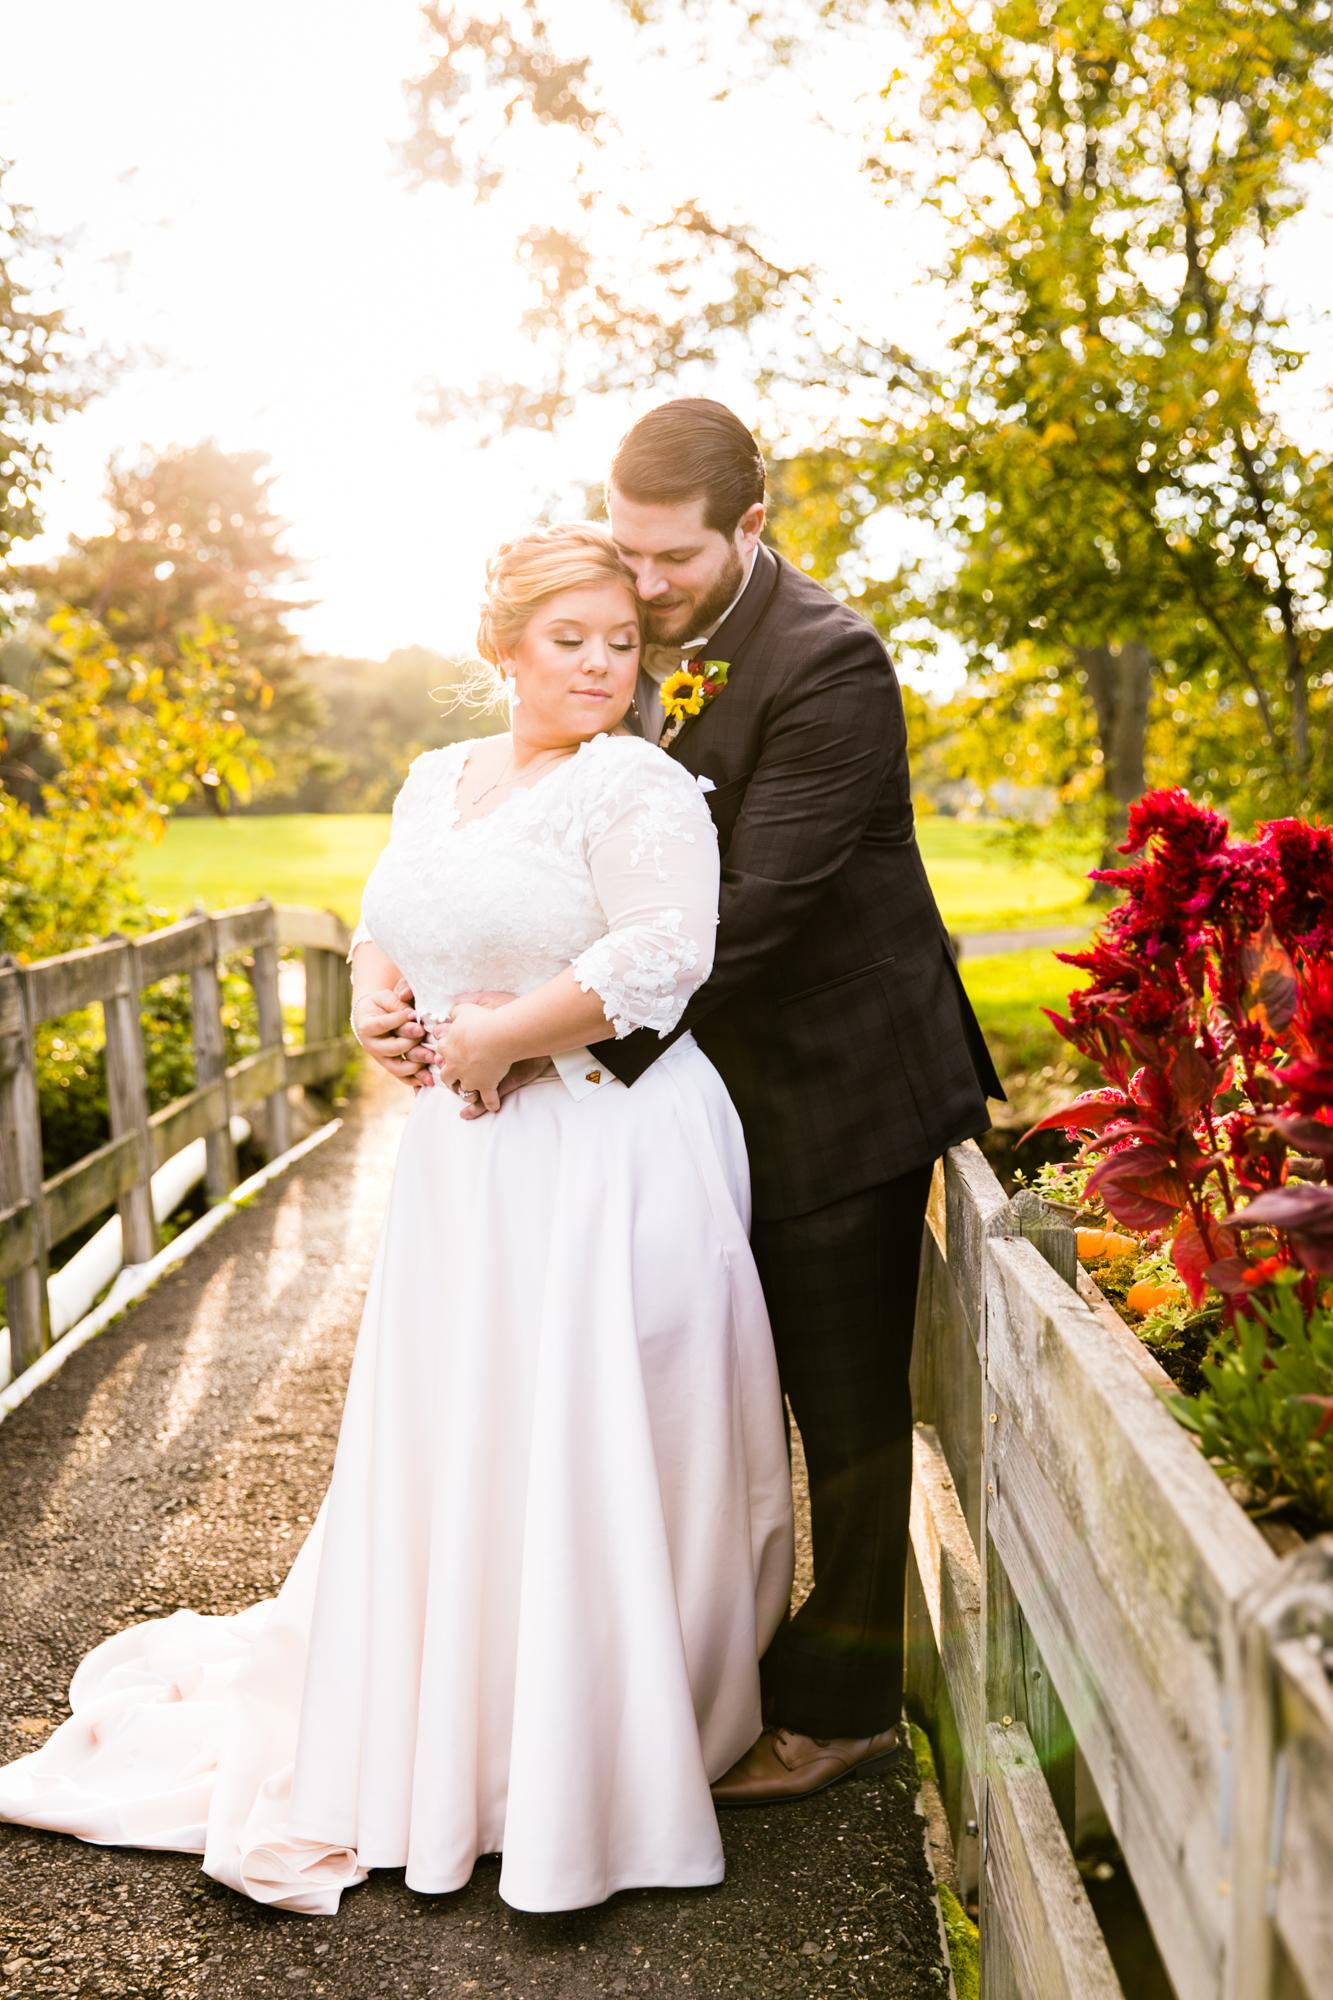 Cedar Brook Country Club Wedding Photography - Lovestruck Pictures-054.jpg